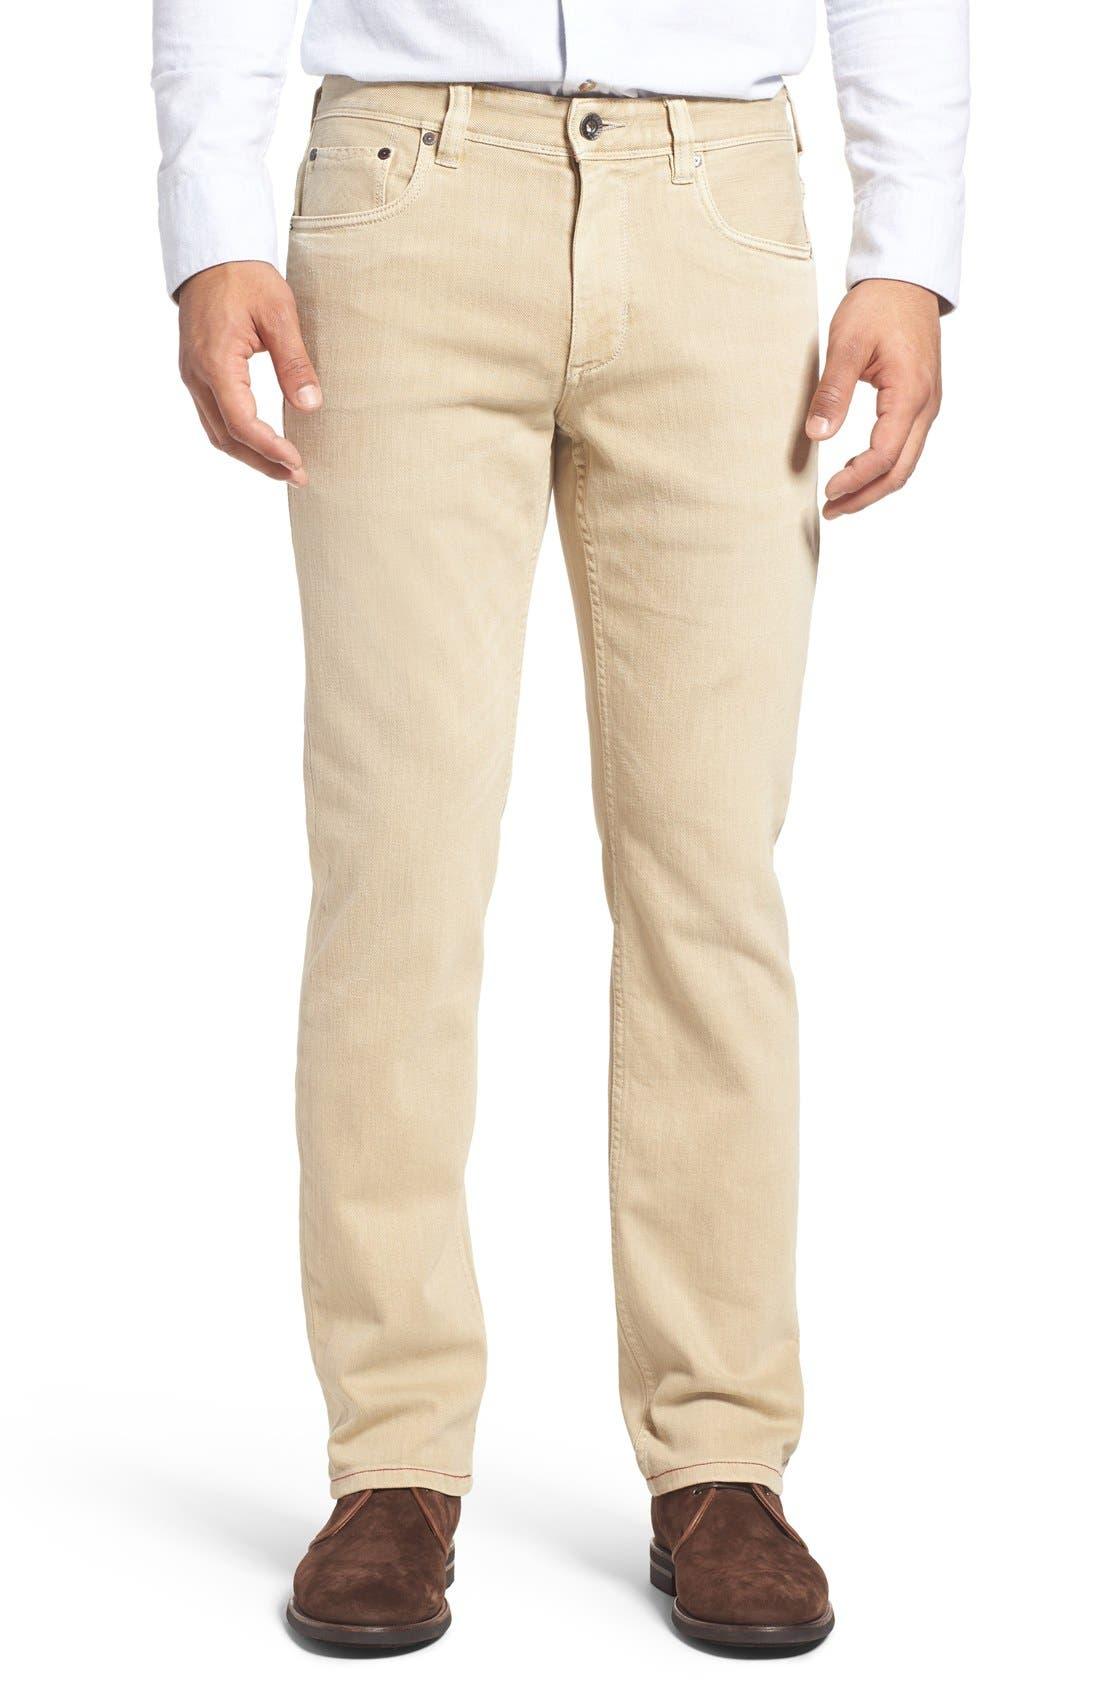 Alternate Image 1 Selected - Tommy Bahama Weft Side Keys Pants